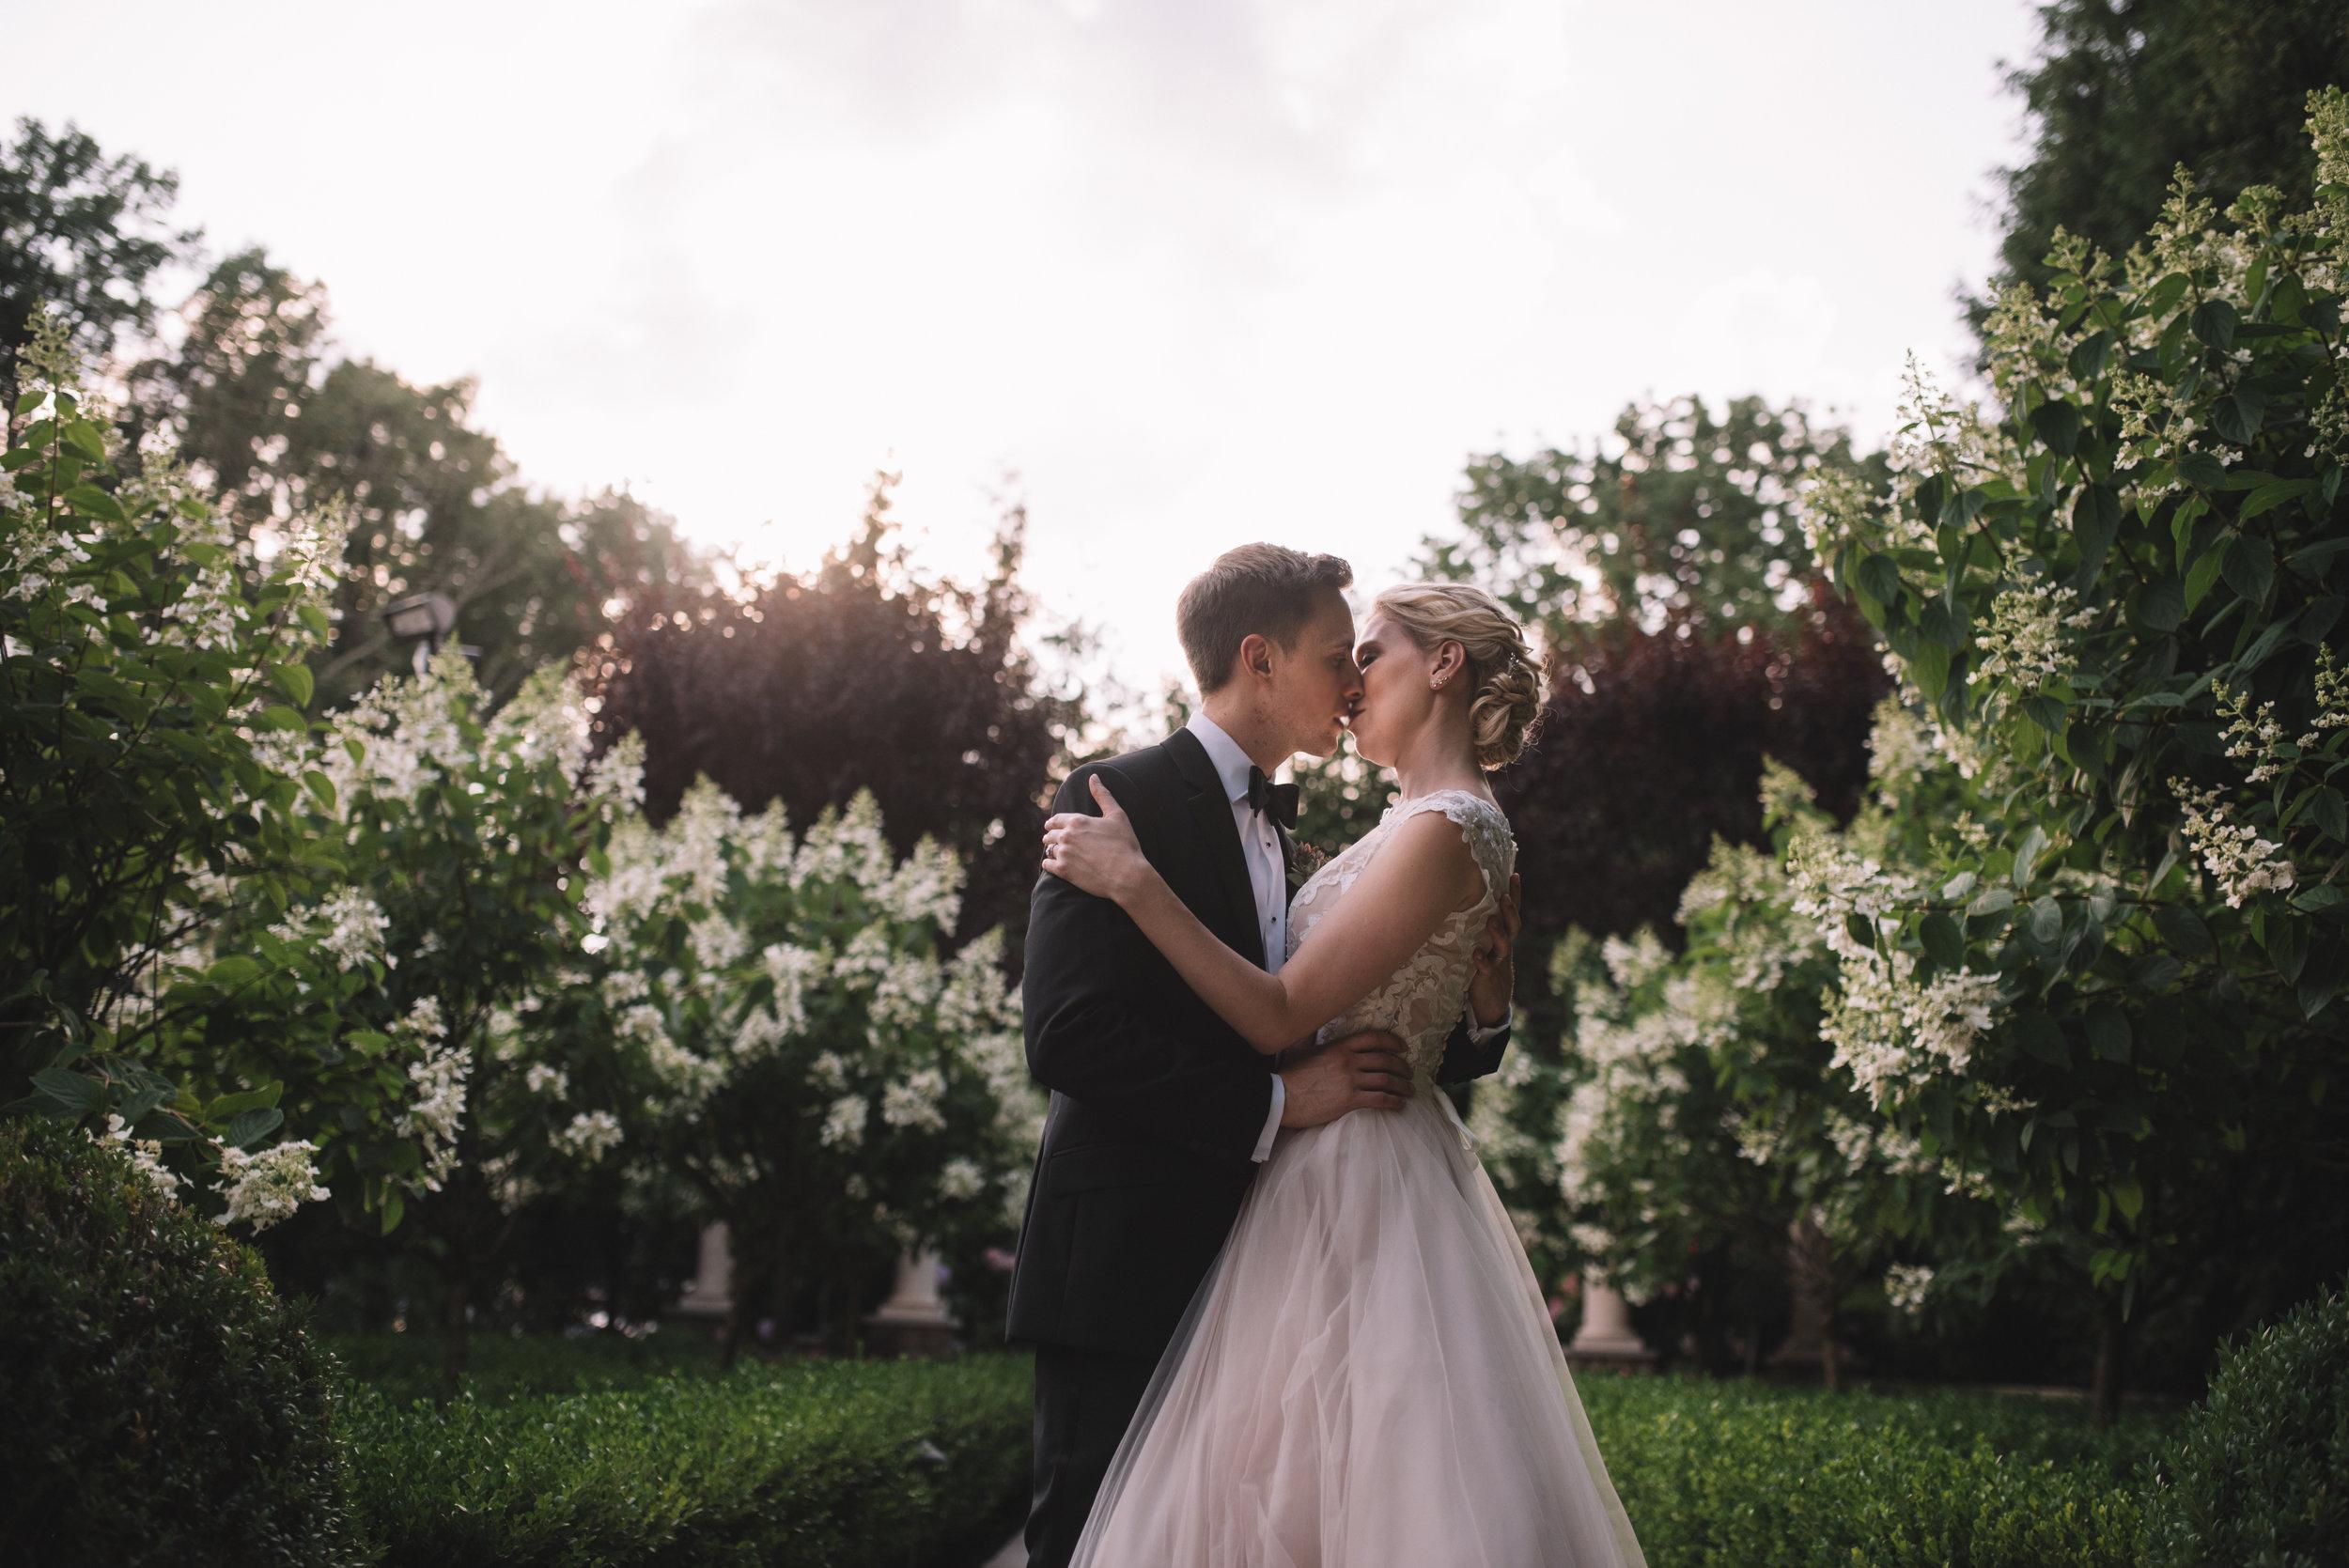 WeddingPhotos | NJPhotographer | Highlights-9-10.jpg